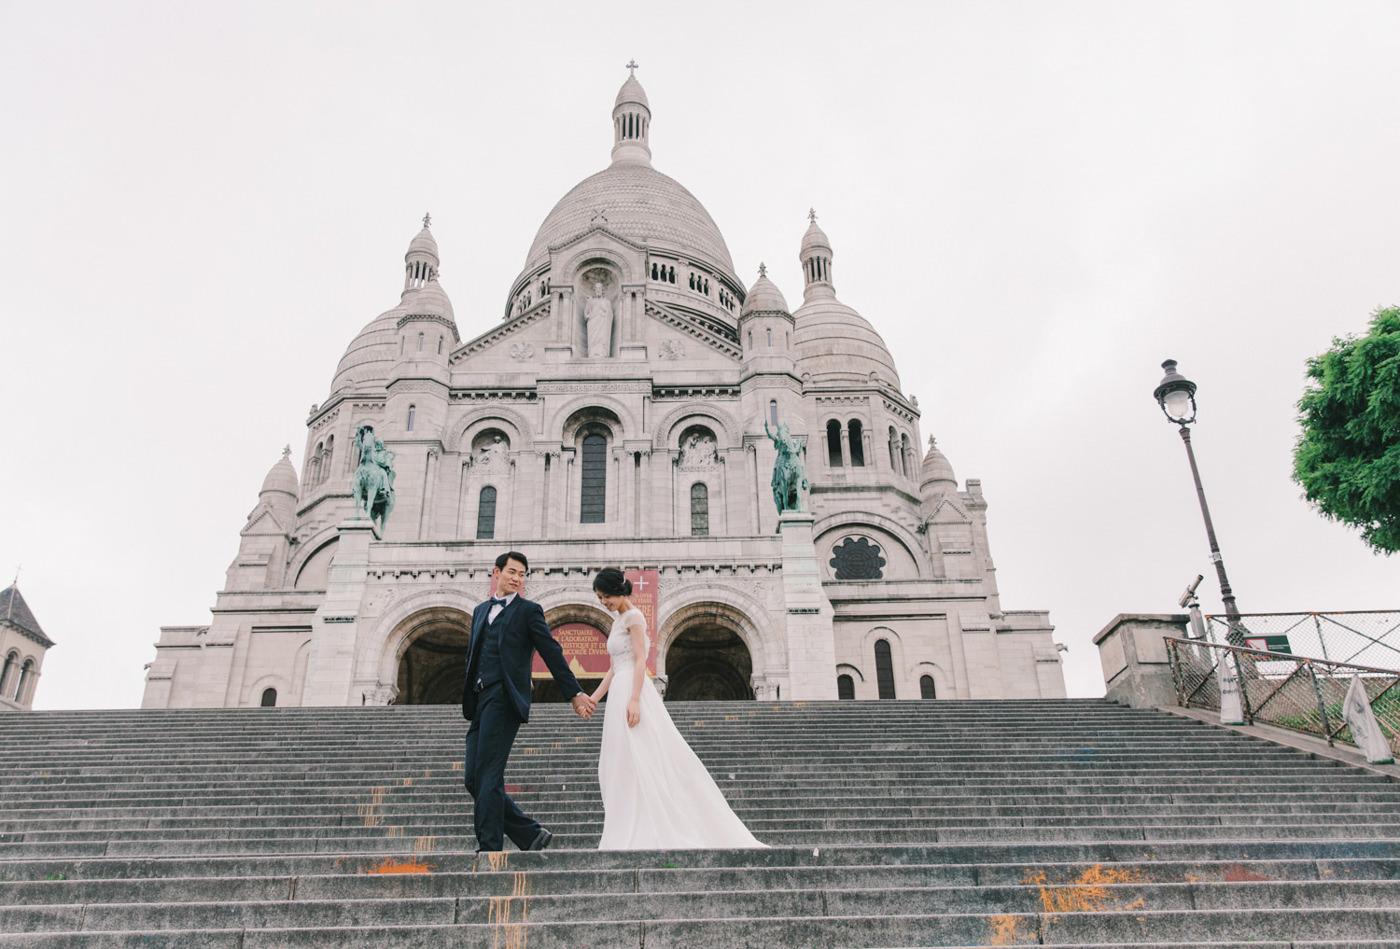 Intimate_Paris_Wedding_Sacré_Cœur_Photoshoot_Engagement_sessio